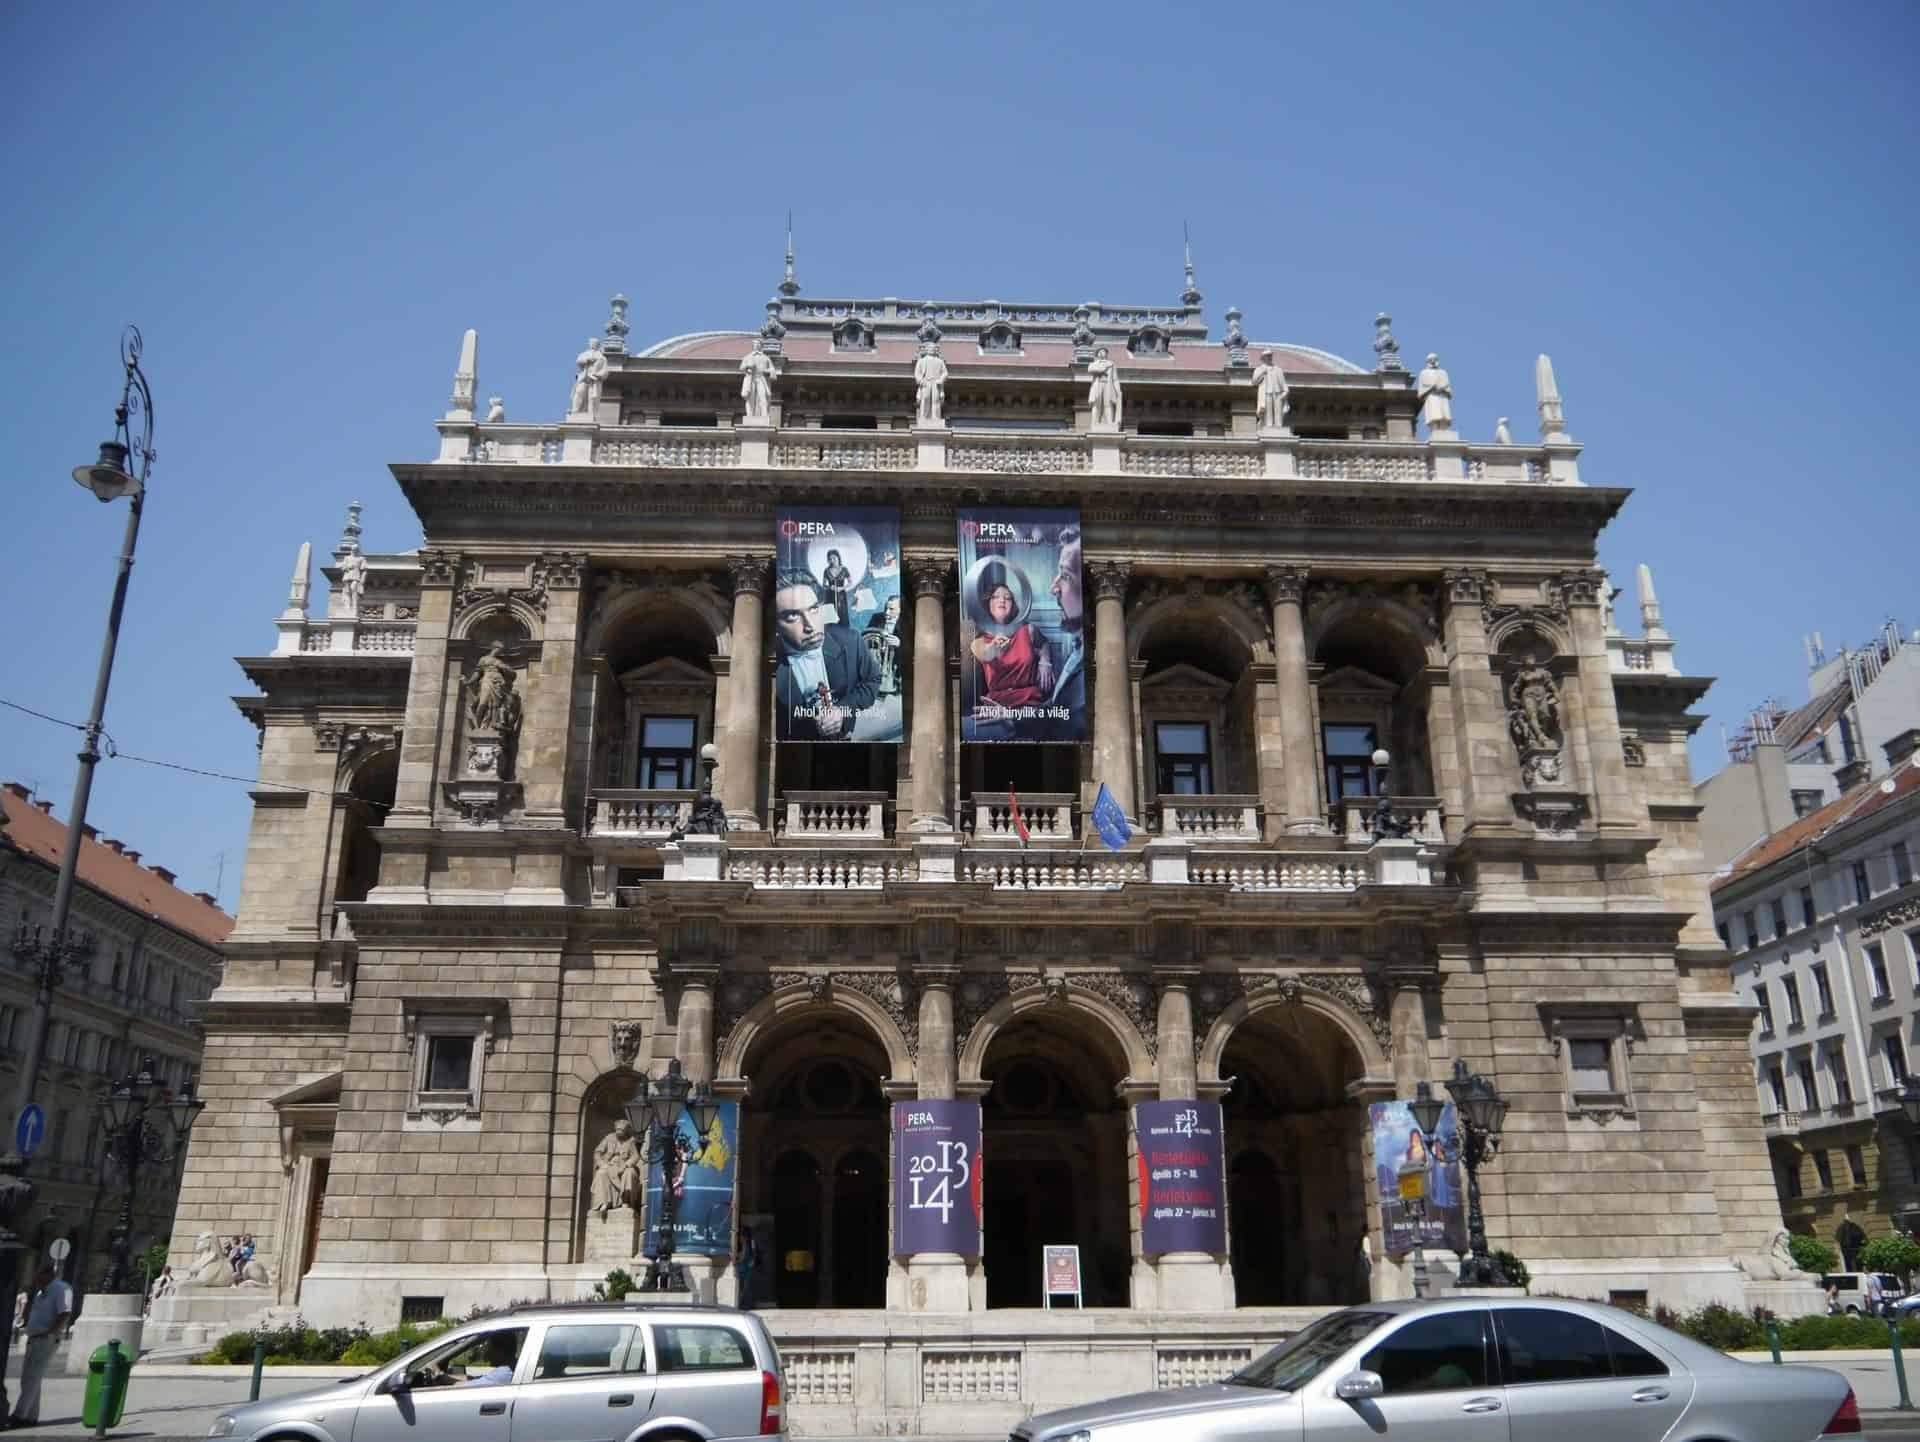 historicalbudapest_Glimpse of Budapest 1 - Opera House_A